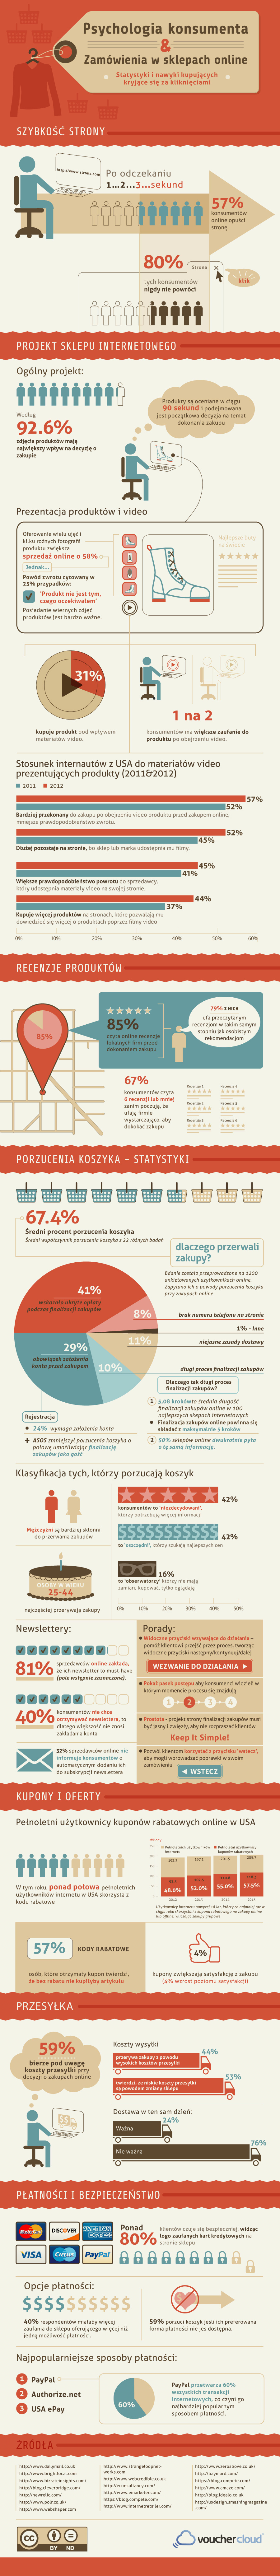 infografika Psychologia konsumenta